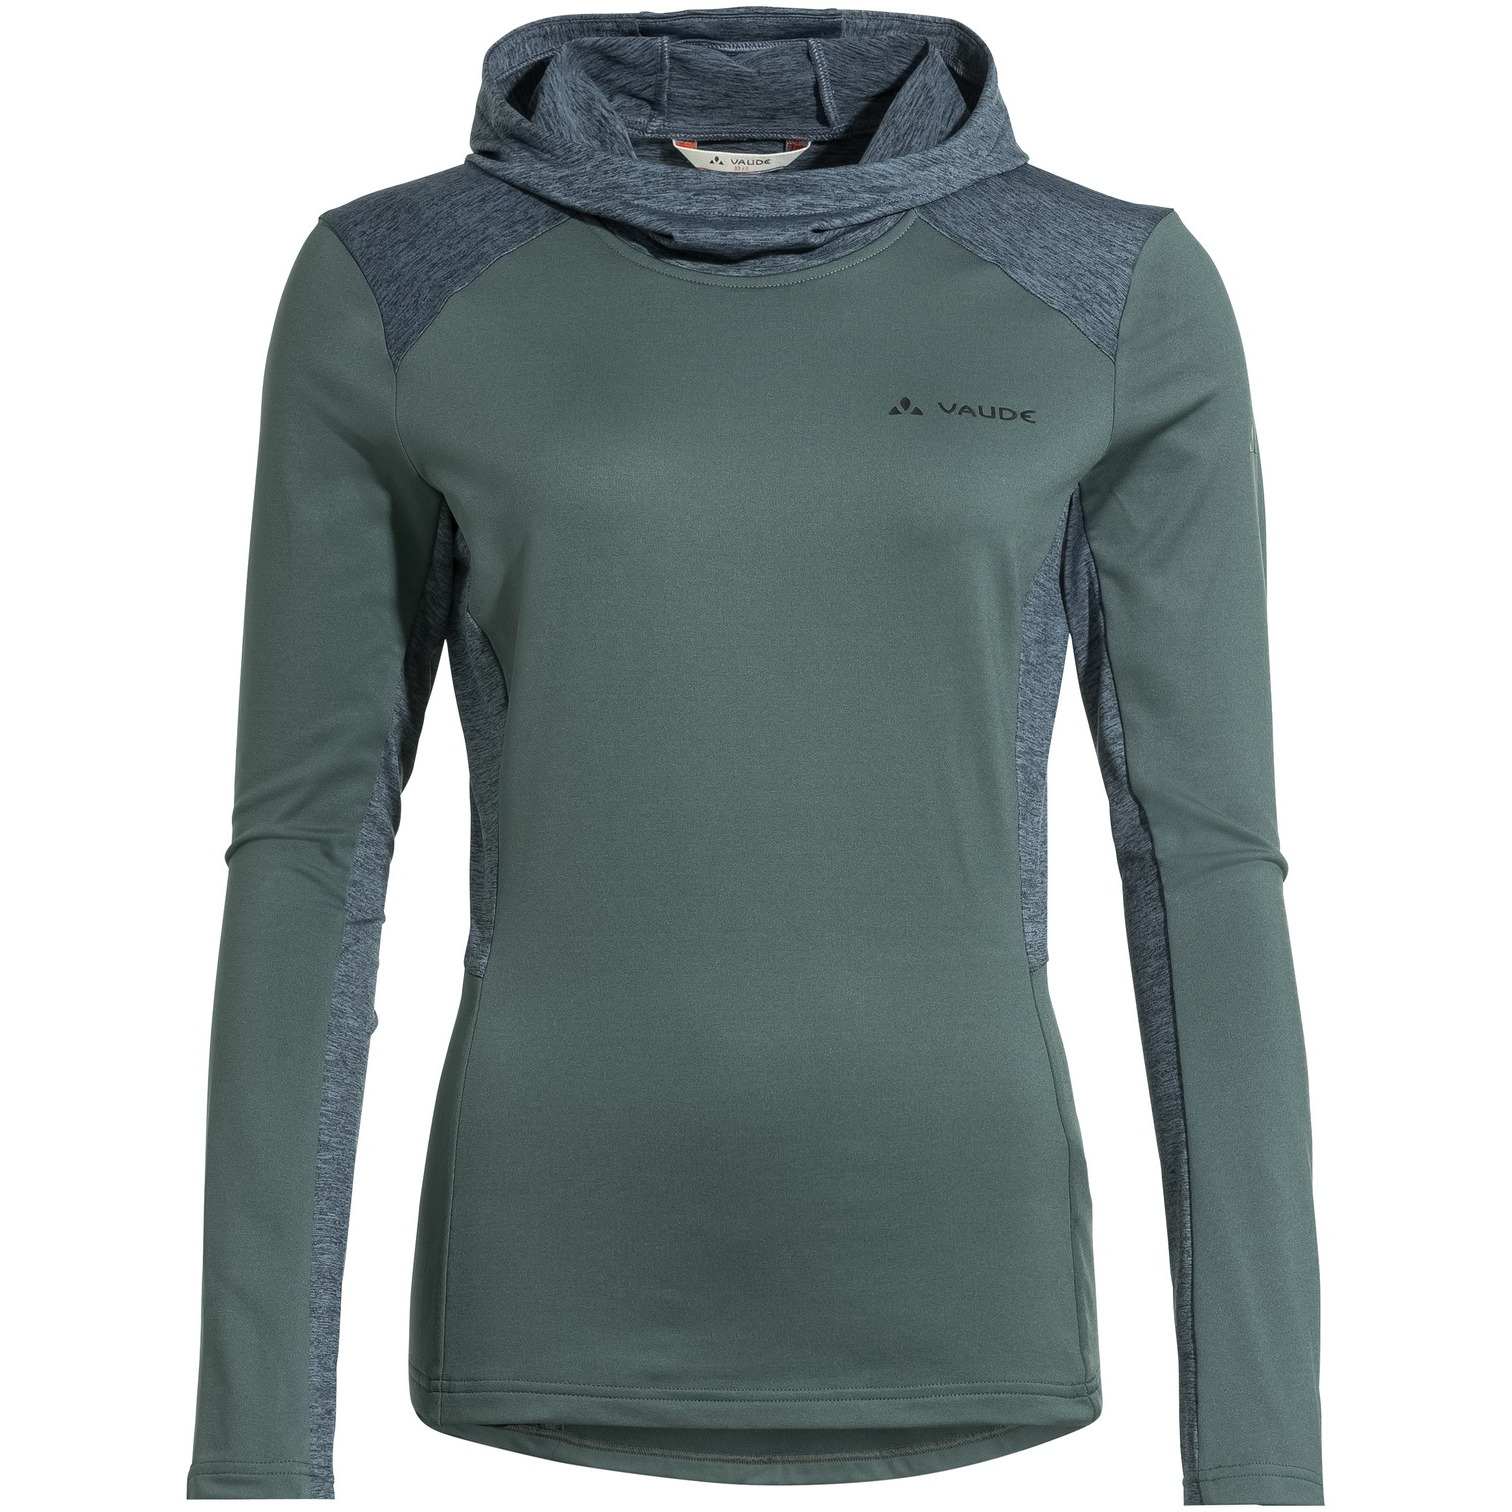 Vaude Women's Qimsa LS T-Shirt - dusty forest